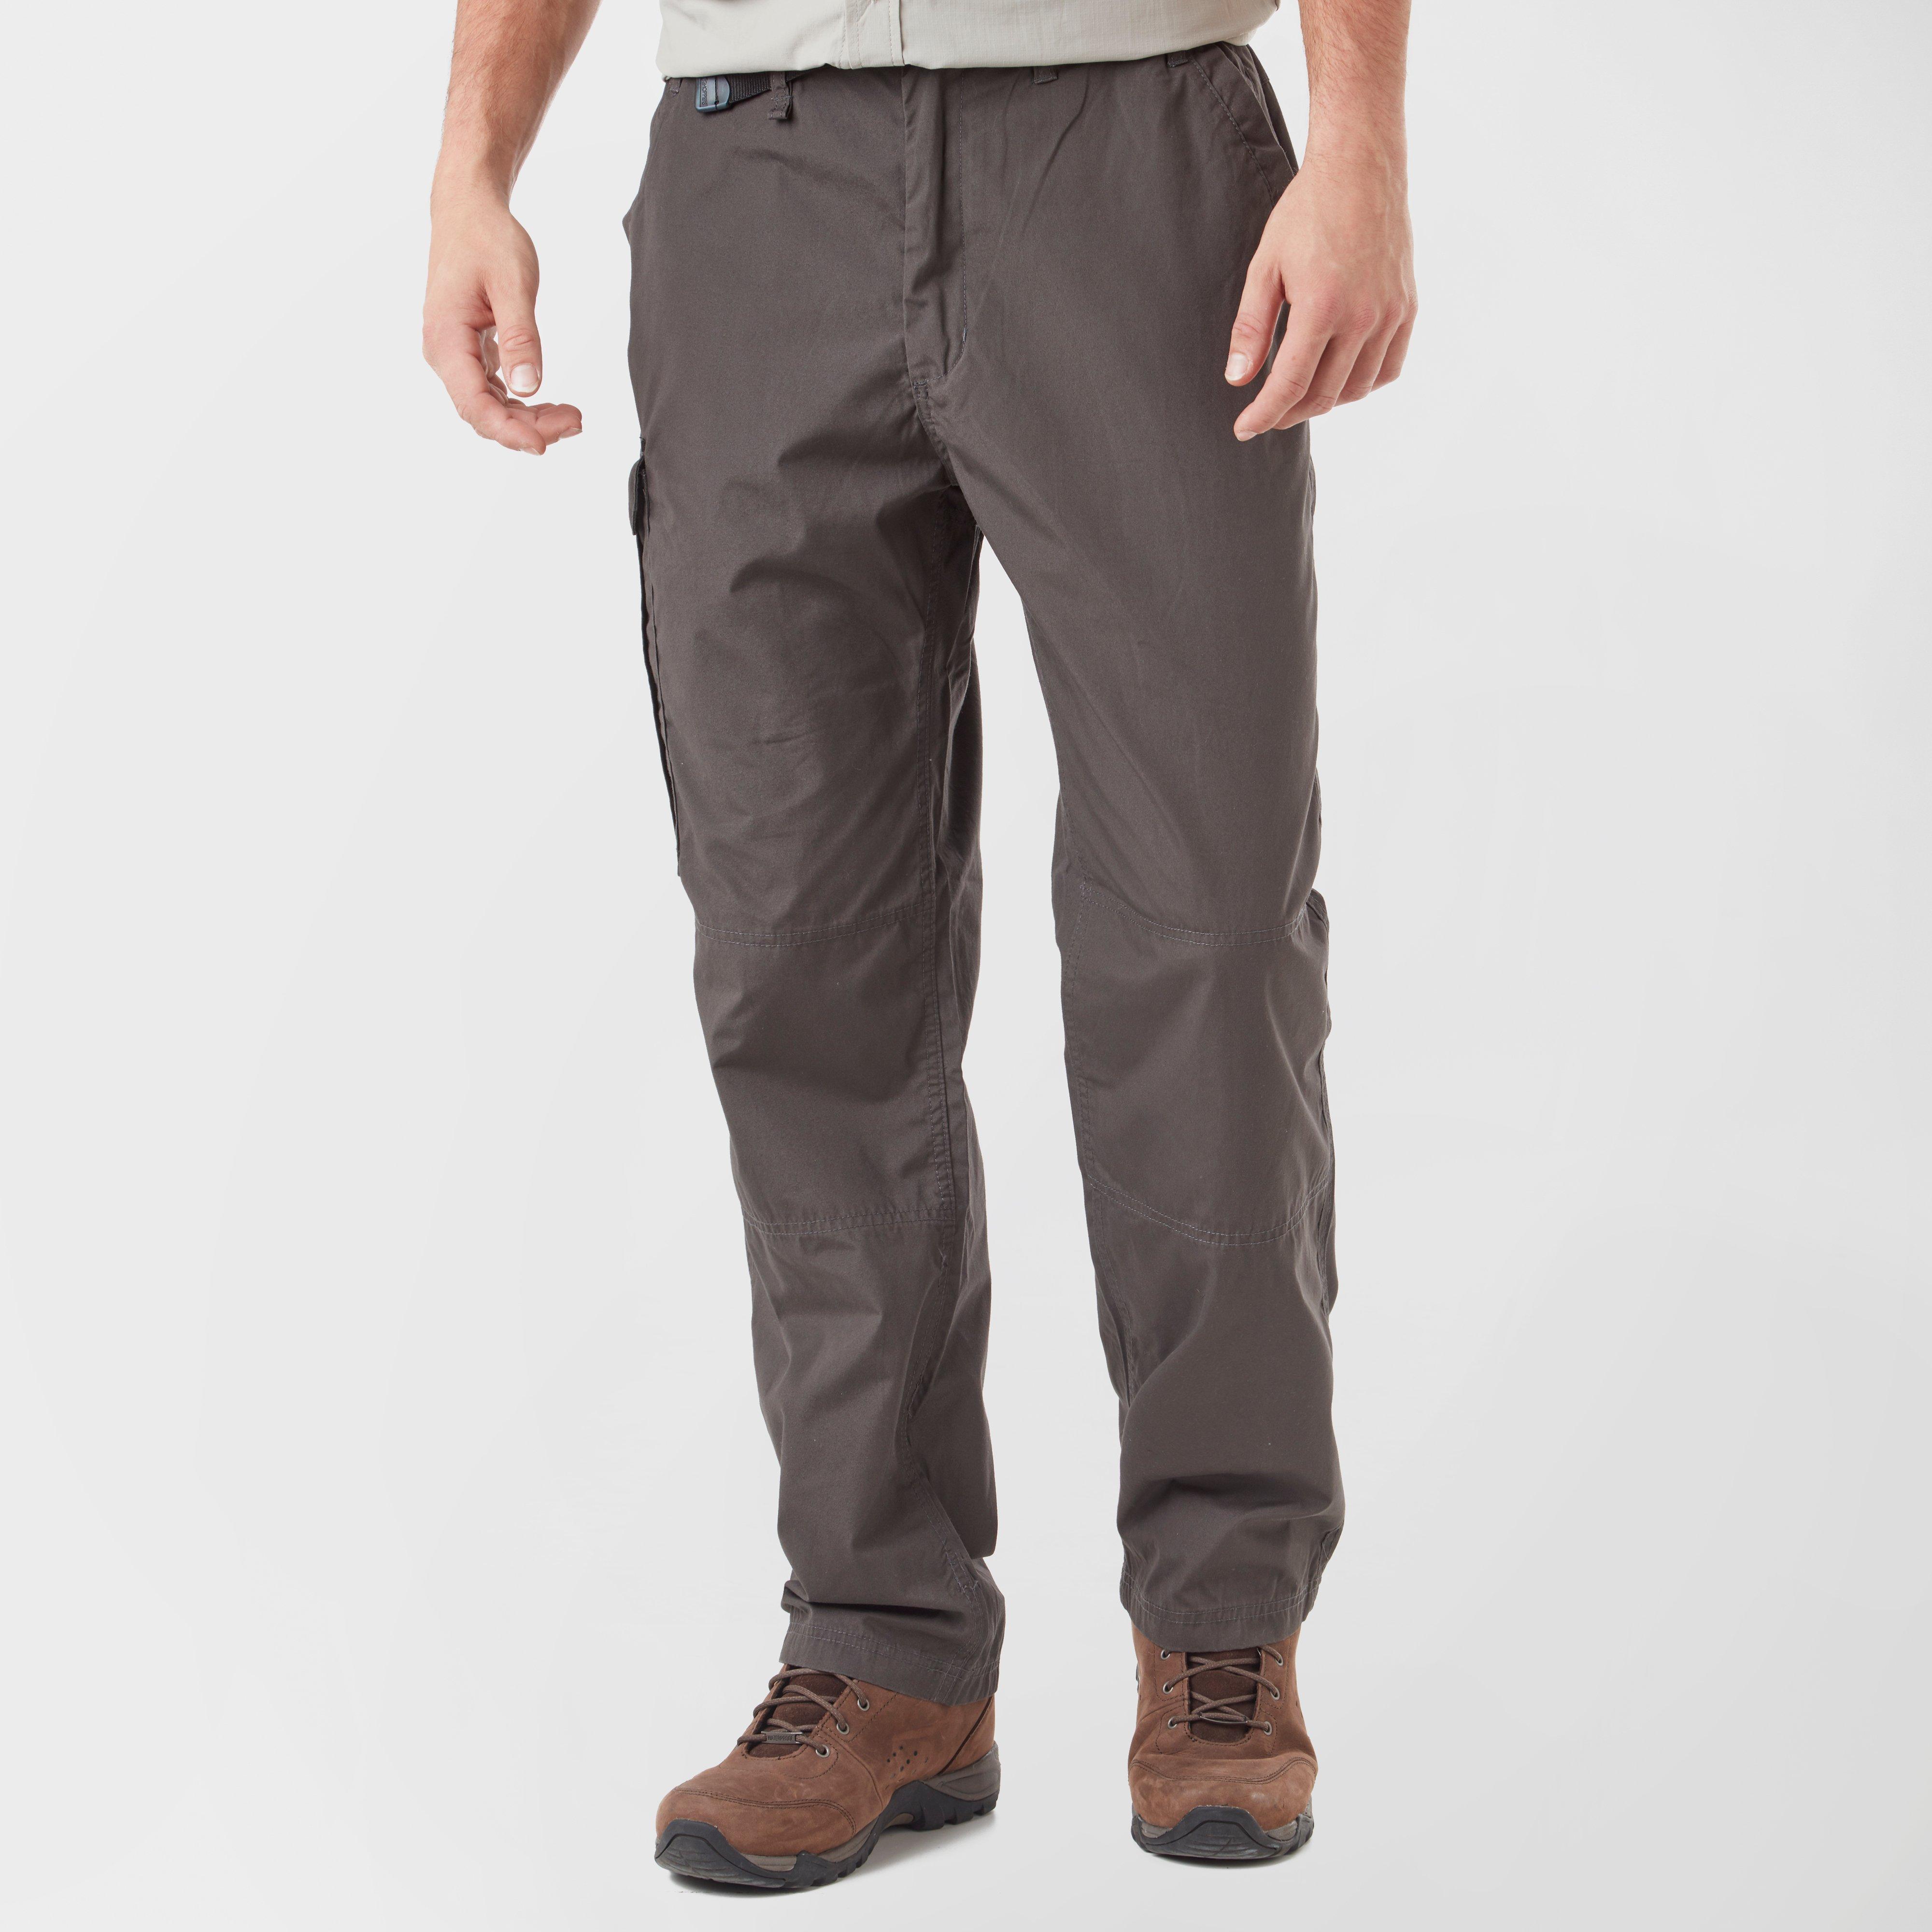 Craghoppers Men's Kiwi Classic Trousers - Brown/Brown, Brown